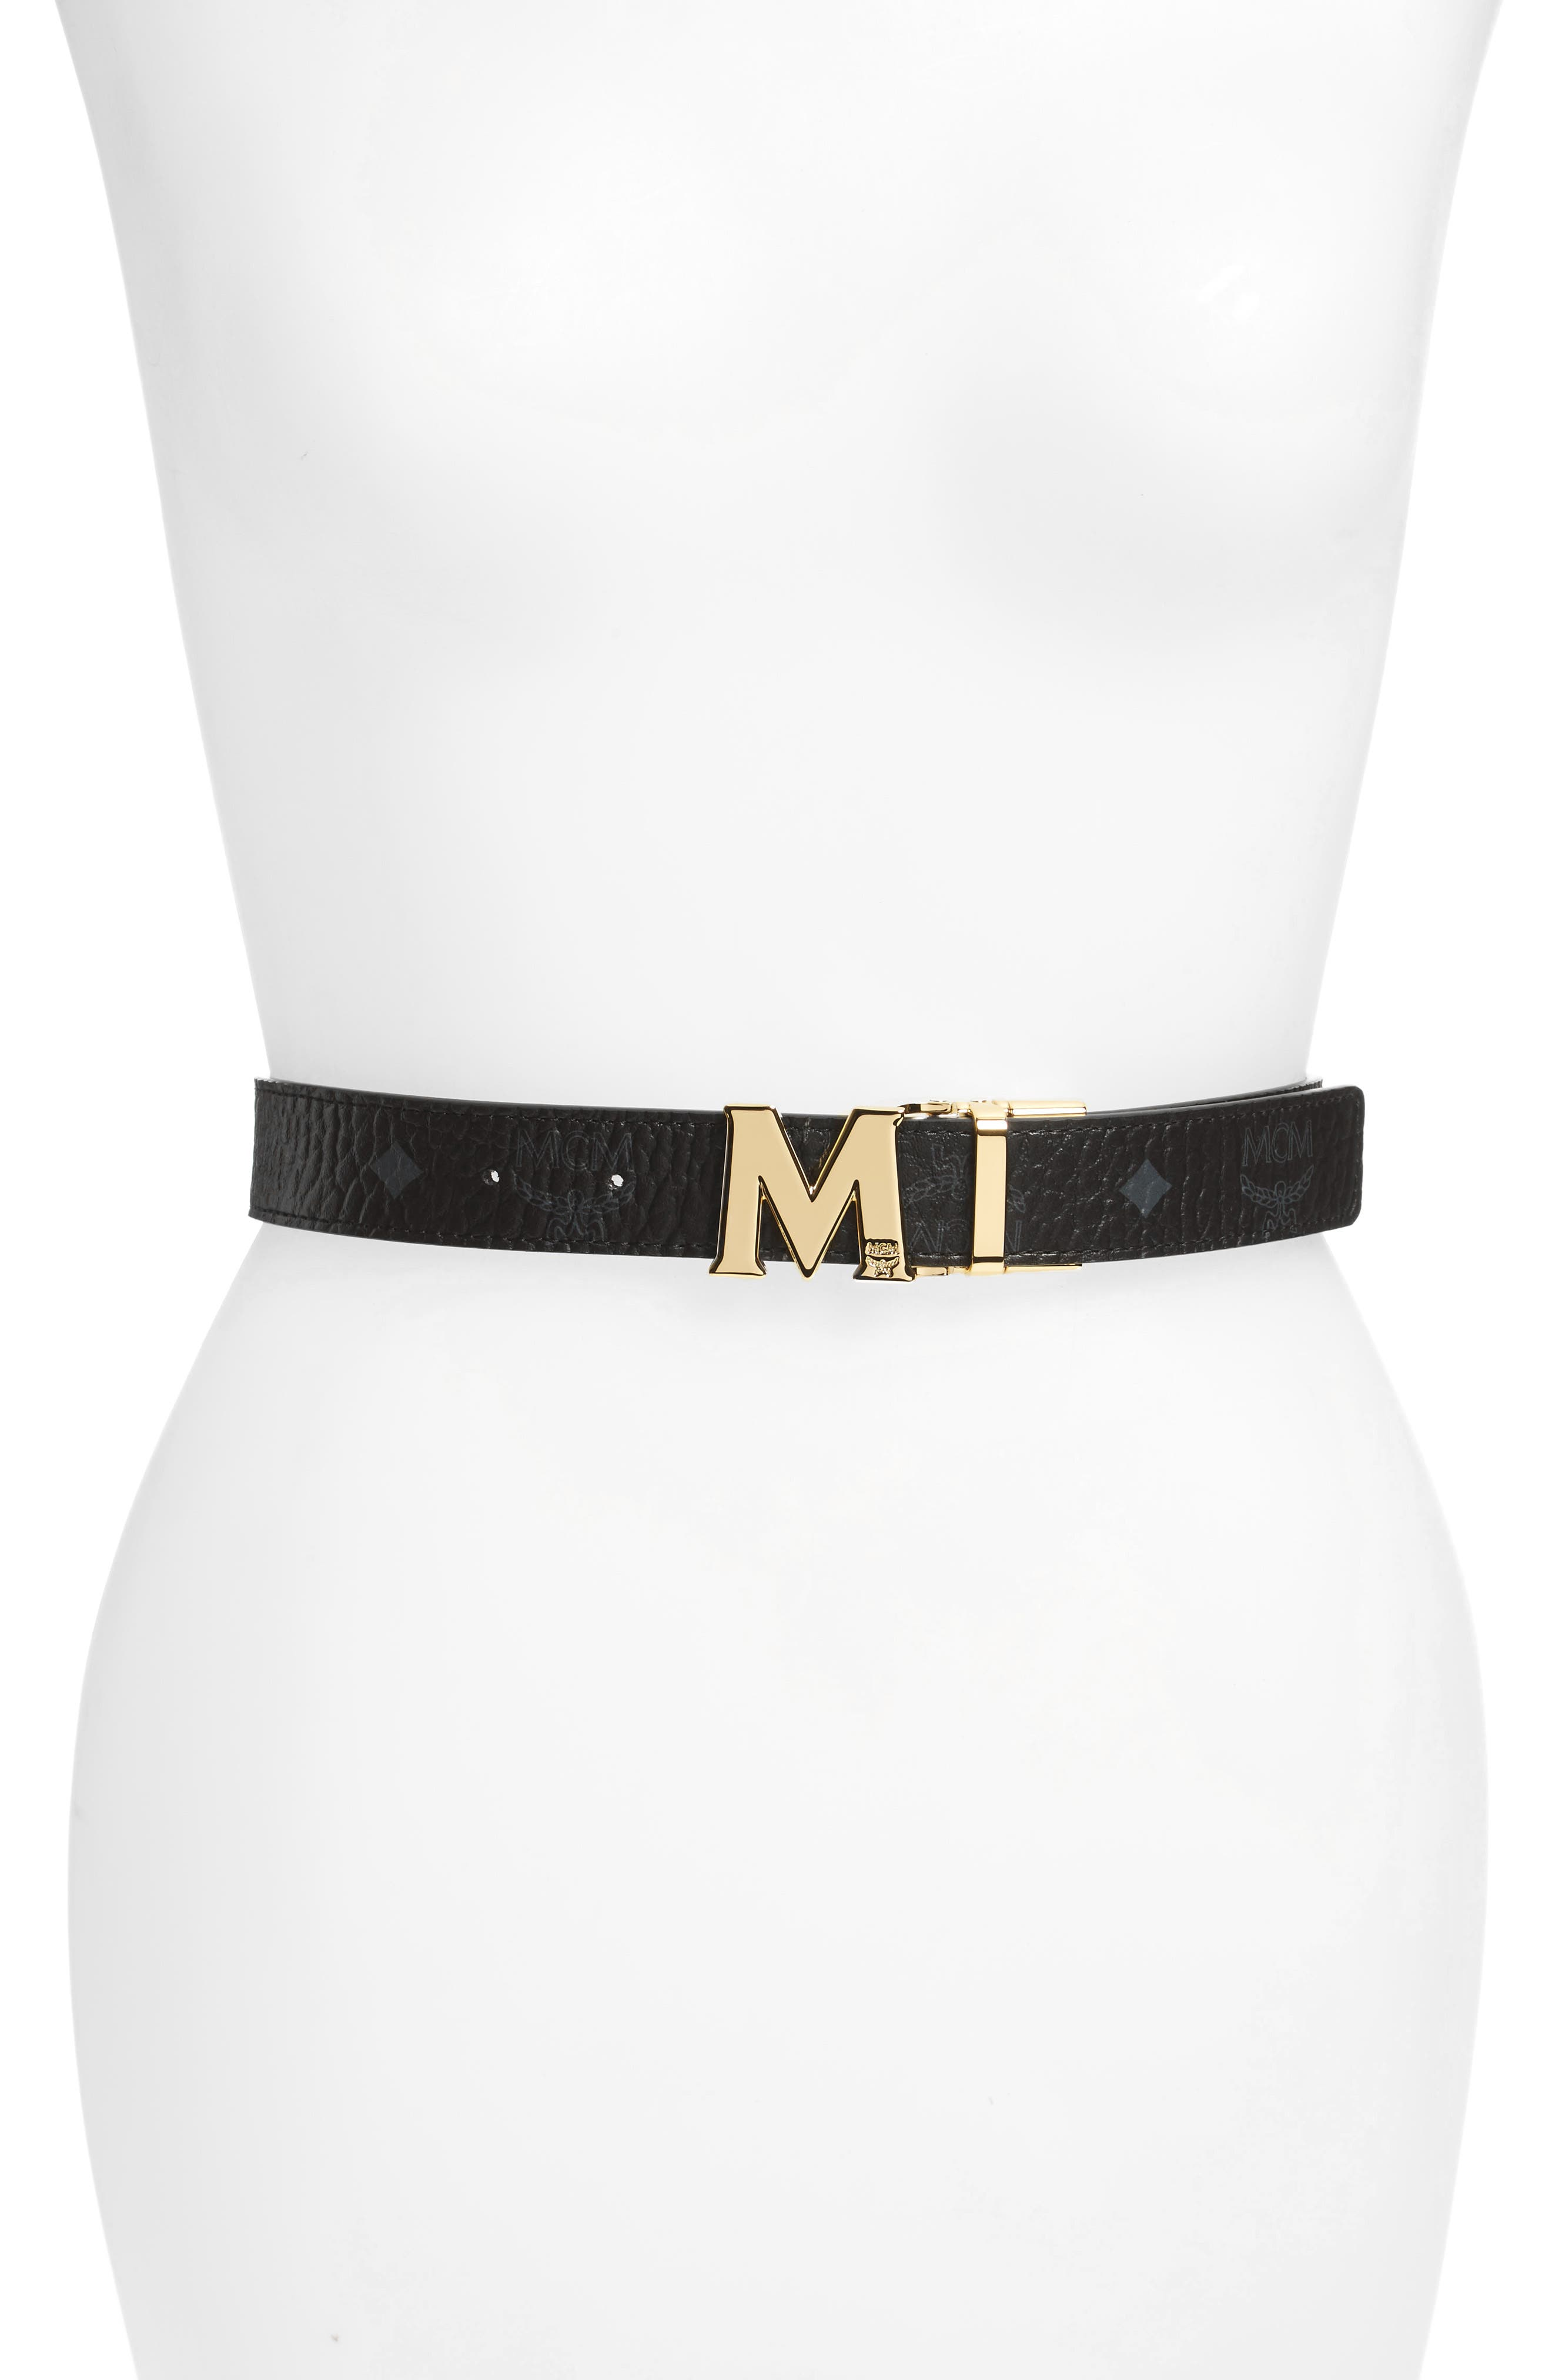 MCM Visetos Reversible Leather Belt, Main, color, BLACK / BLACK (W/ GOLD)